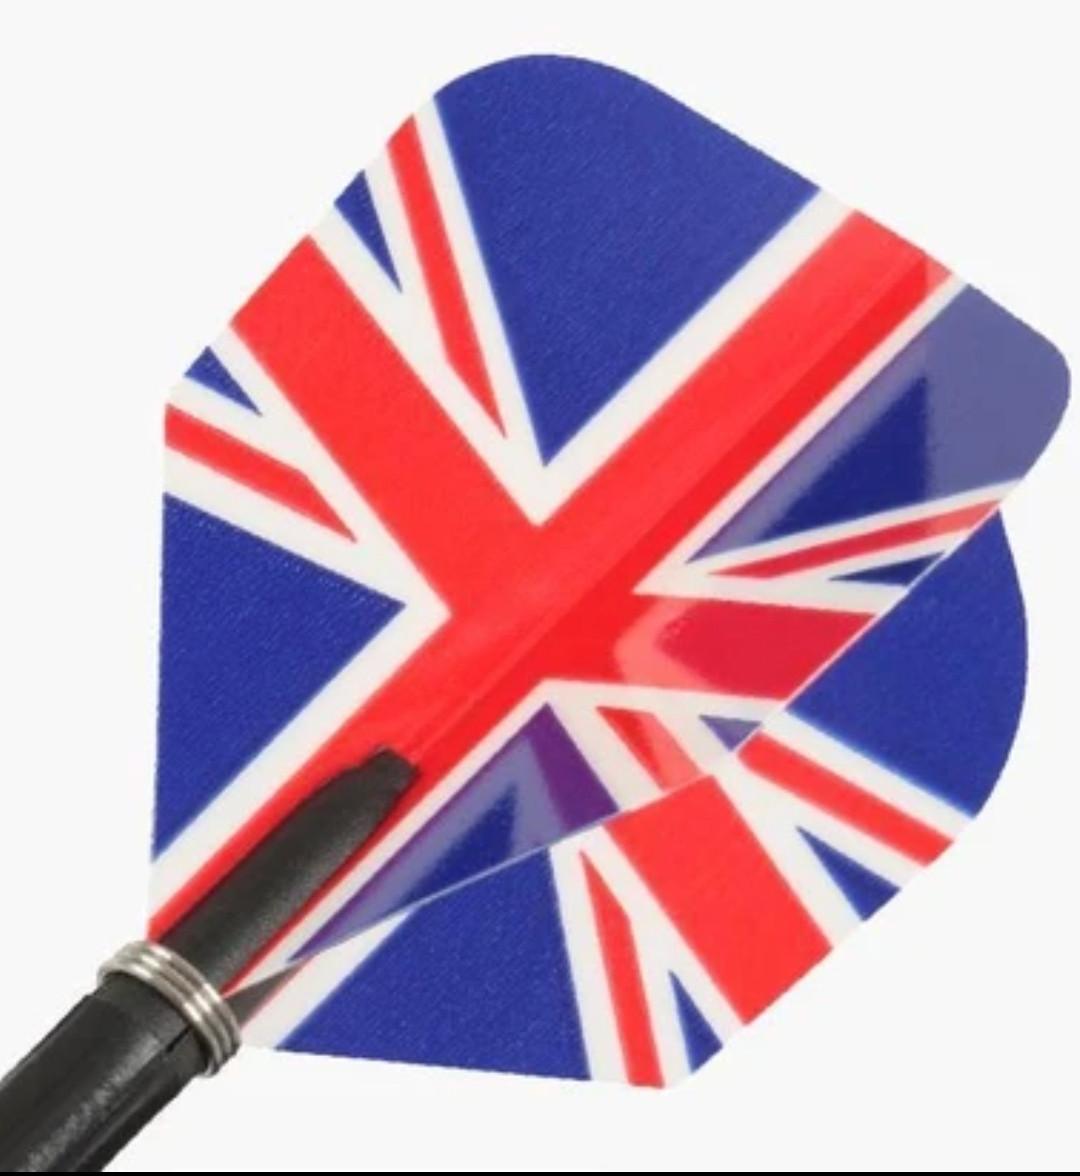 Набор British для дротиков дартс 6 шт. Англия